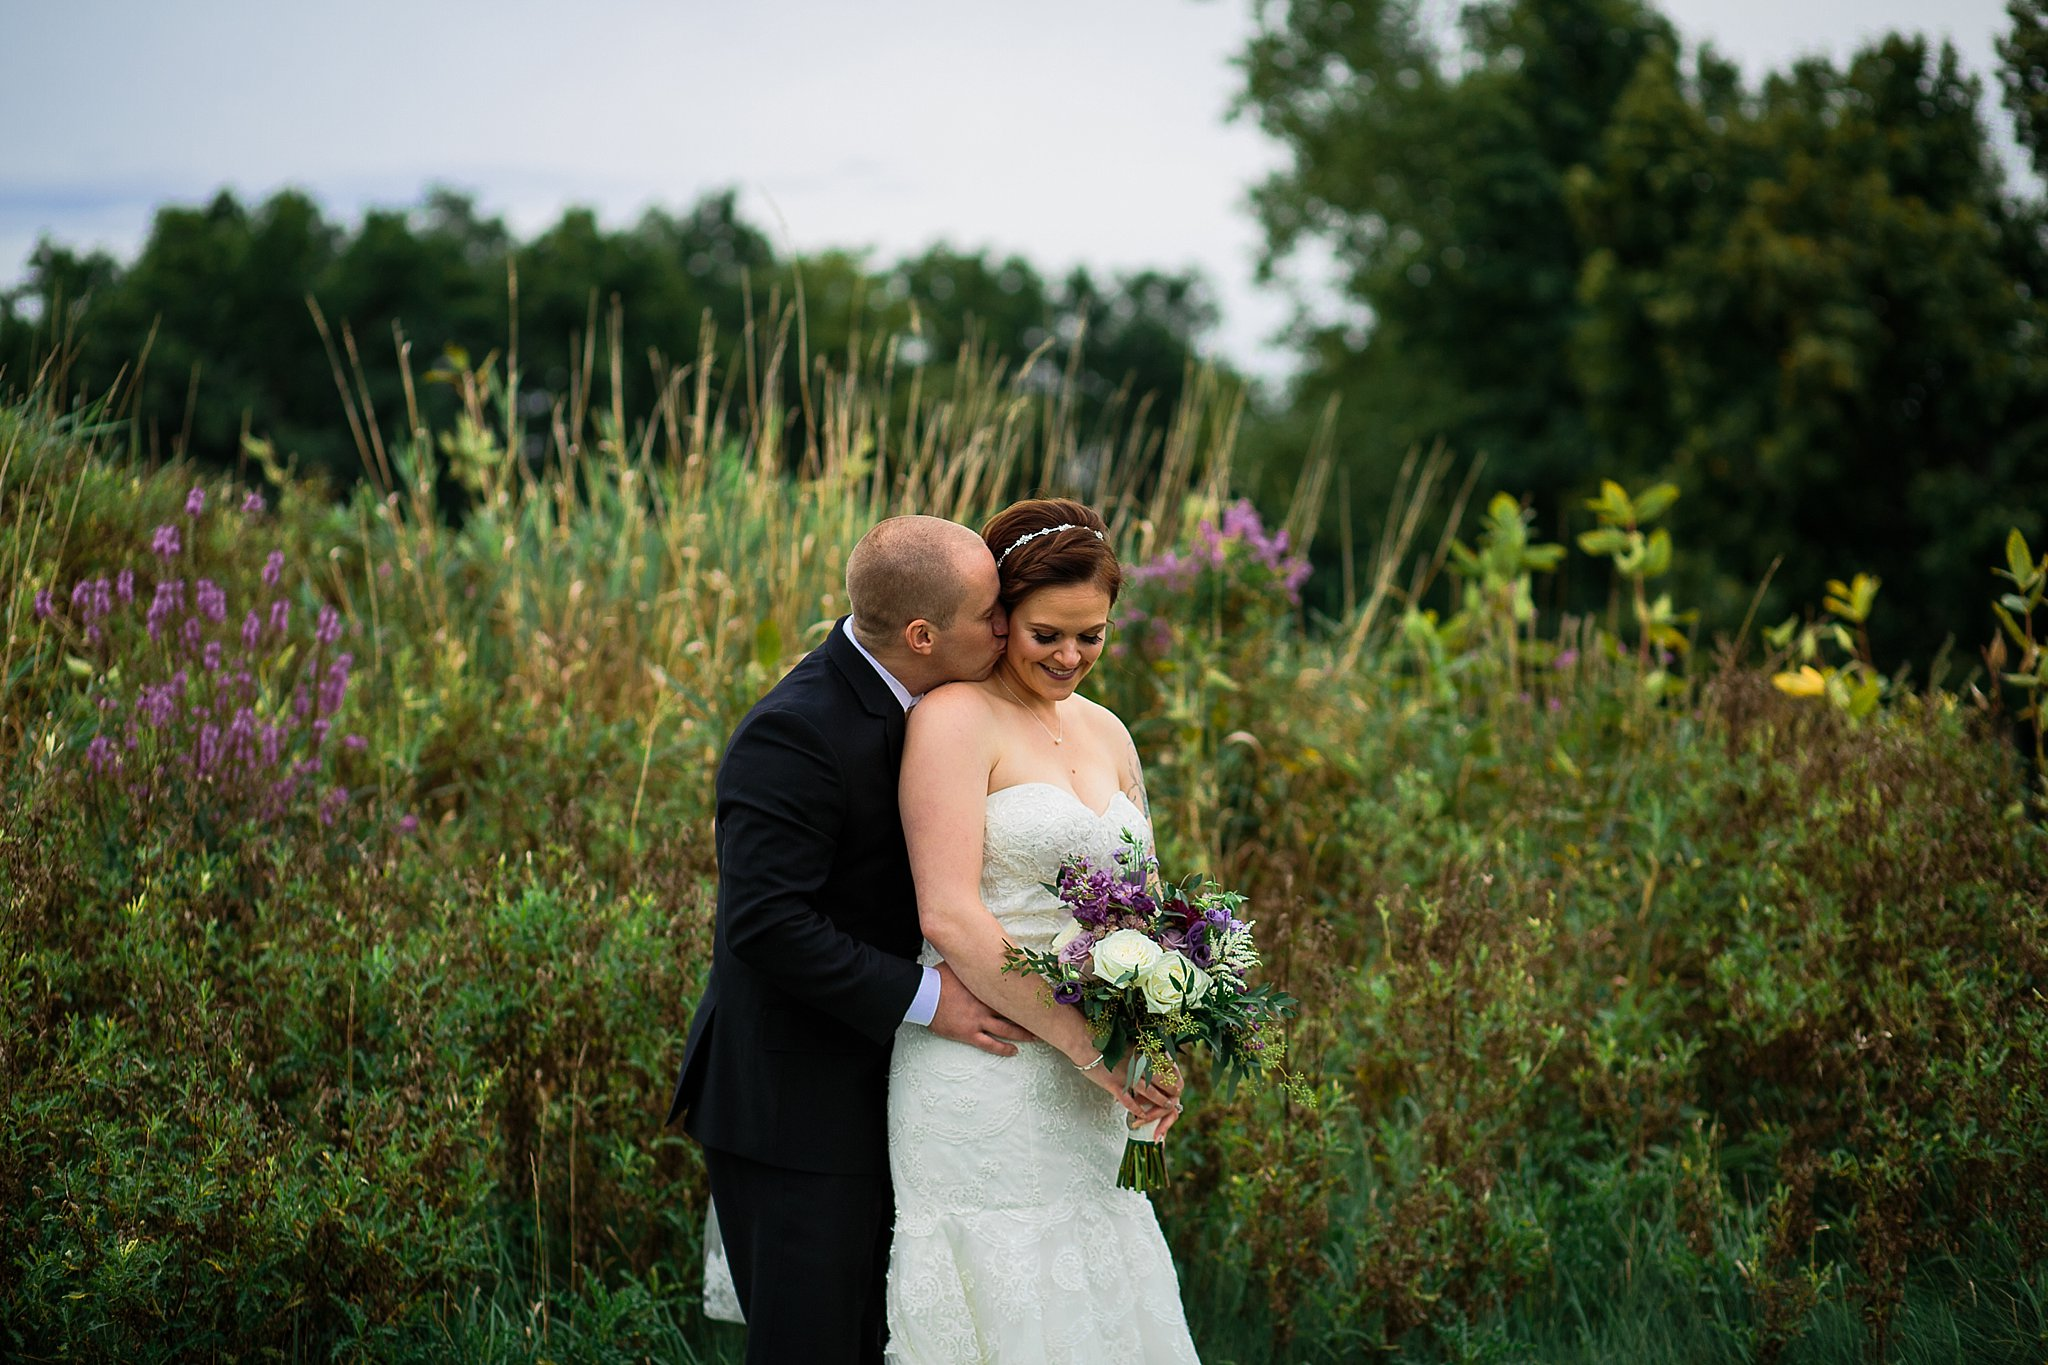 Links at Unionvale Wedding Lagrangeville Wedding Hudson Valley Wedding Photographer Sweet Alice Photography54.jpg